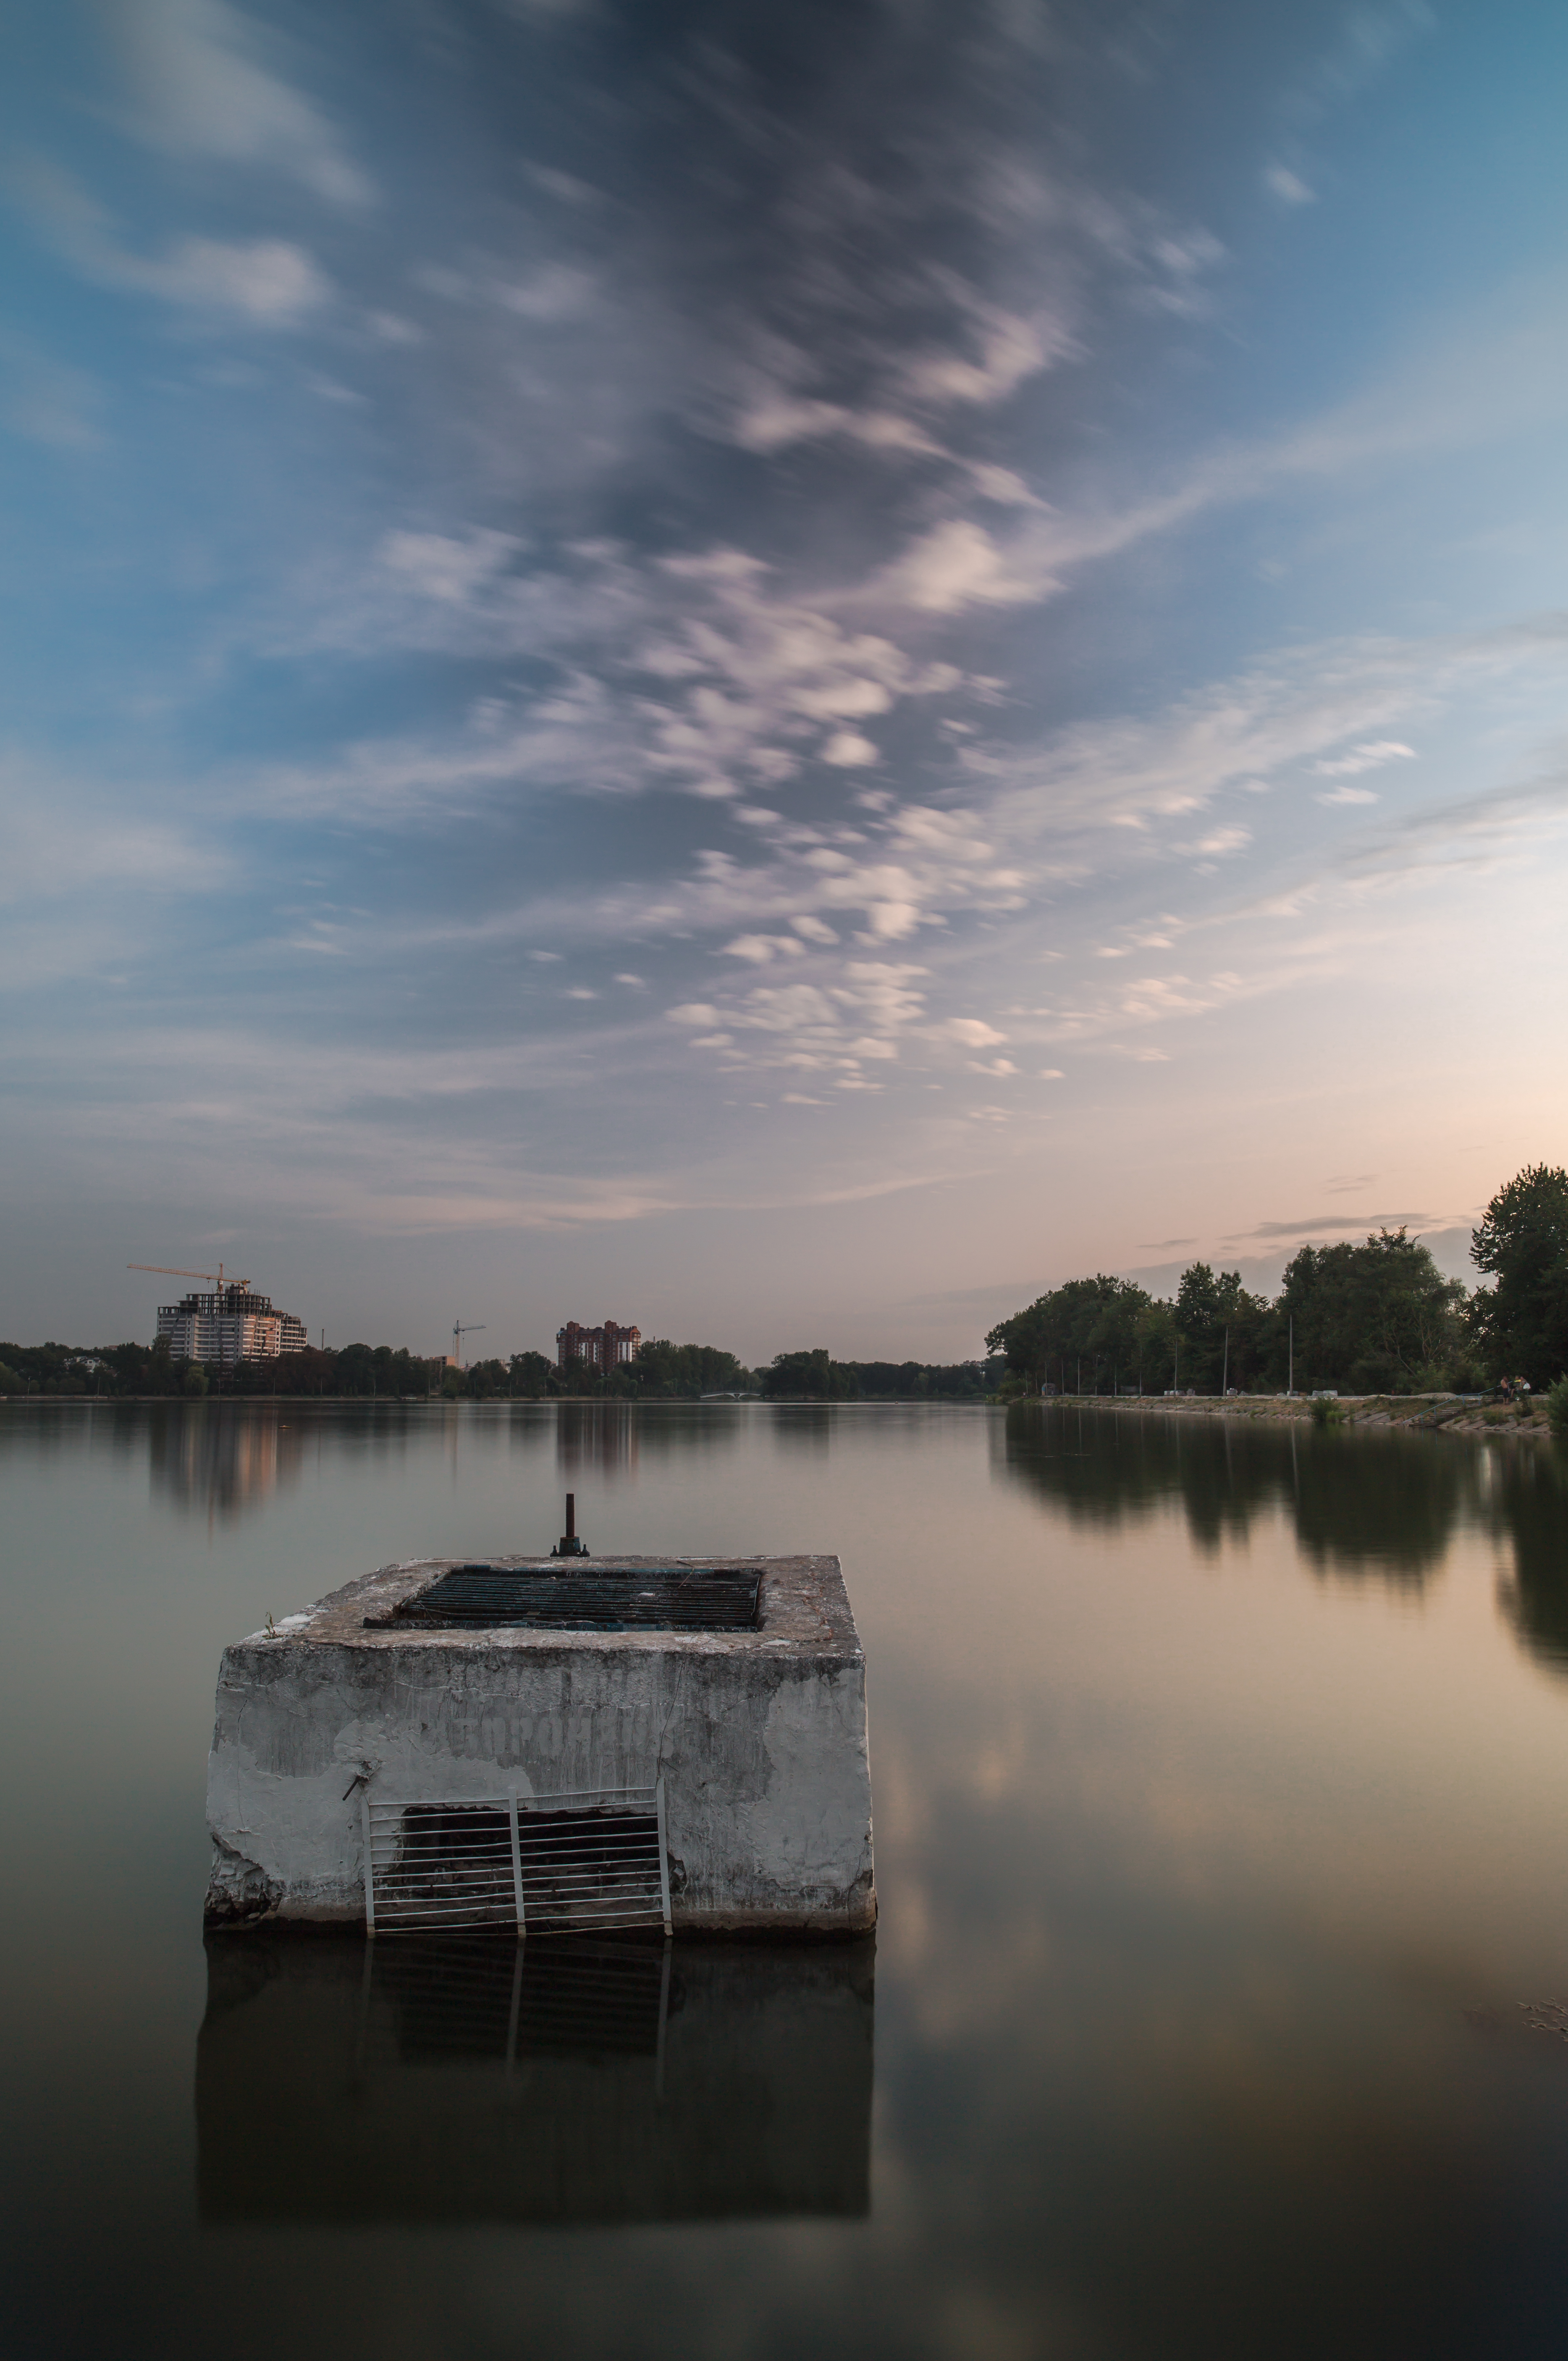 Lake during sunset  example image 1